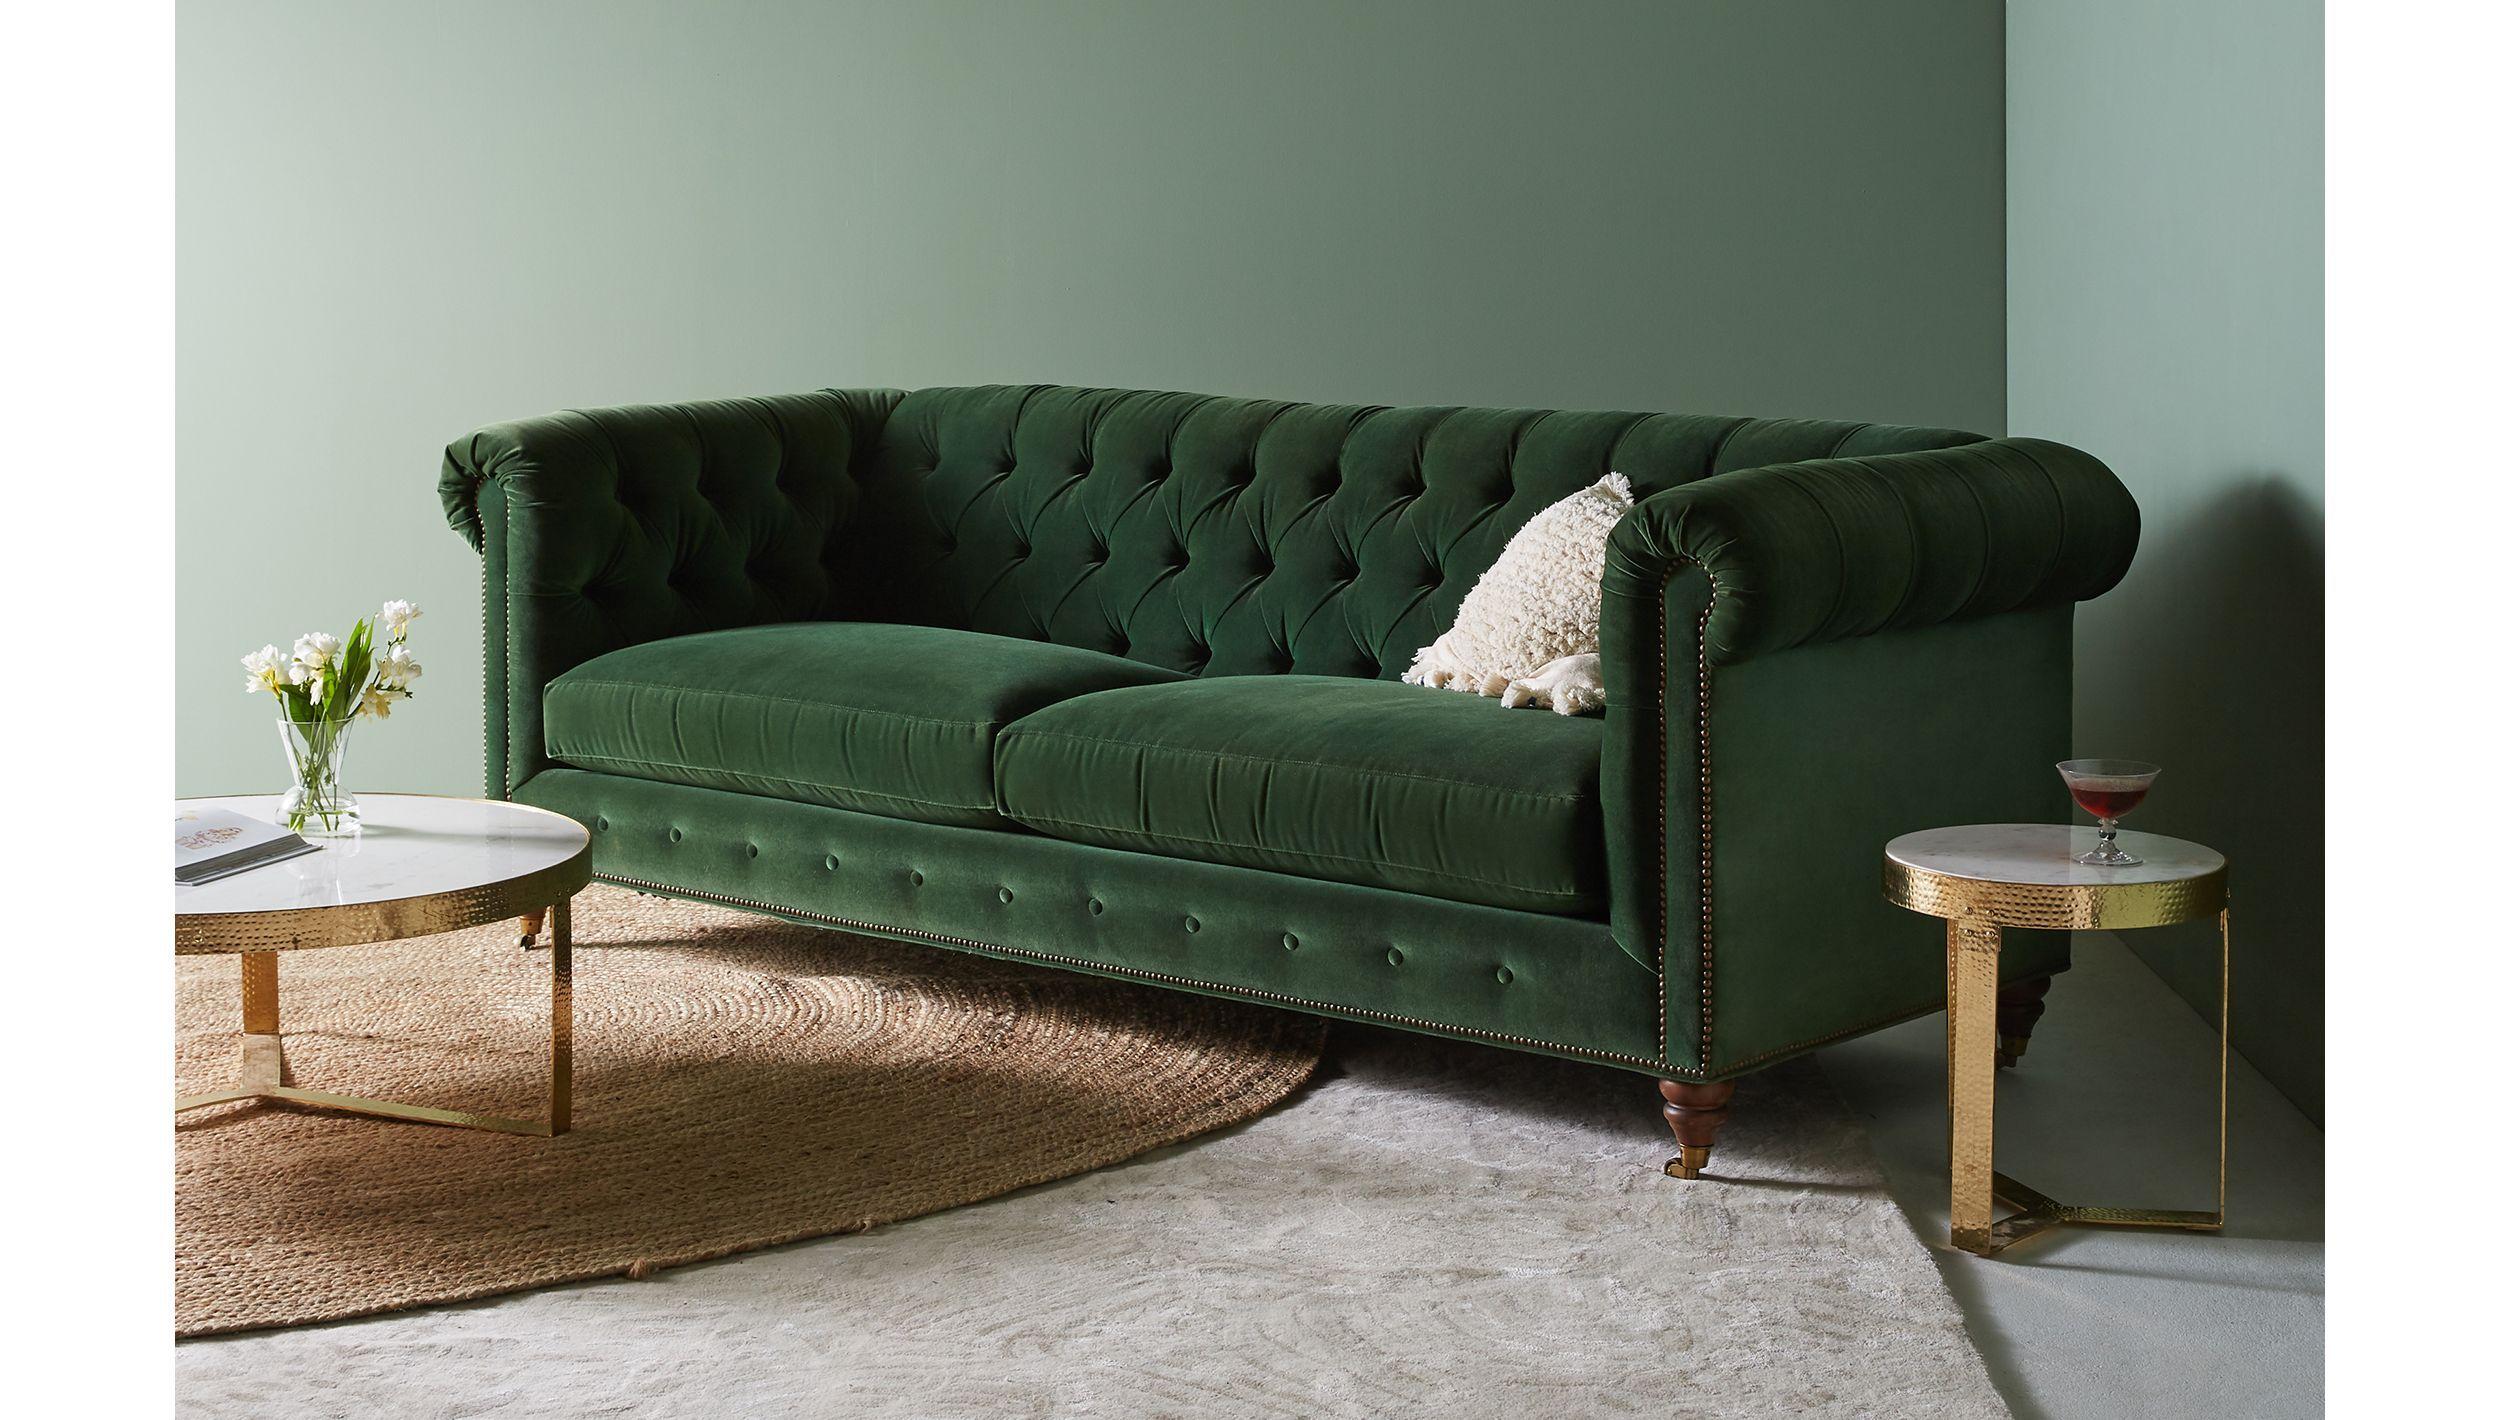 Lyre chesterfield twocushion sofa in mah homie cushions on